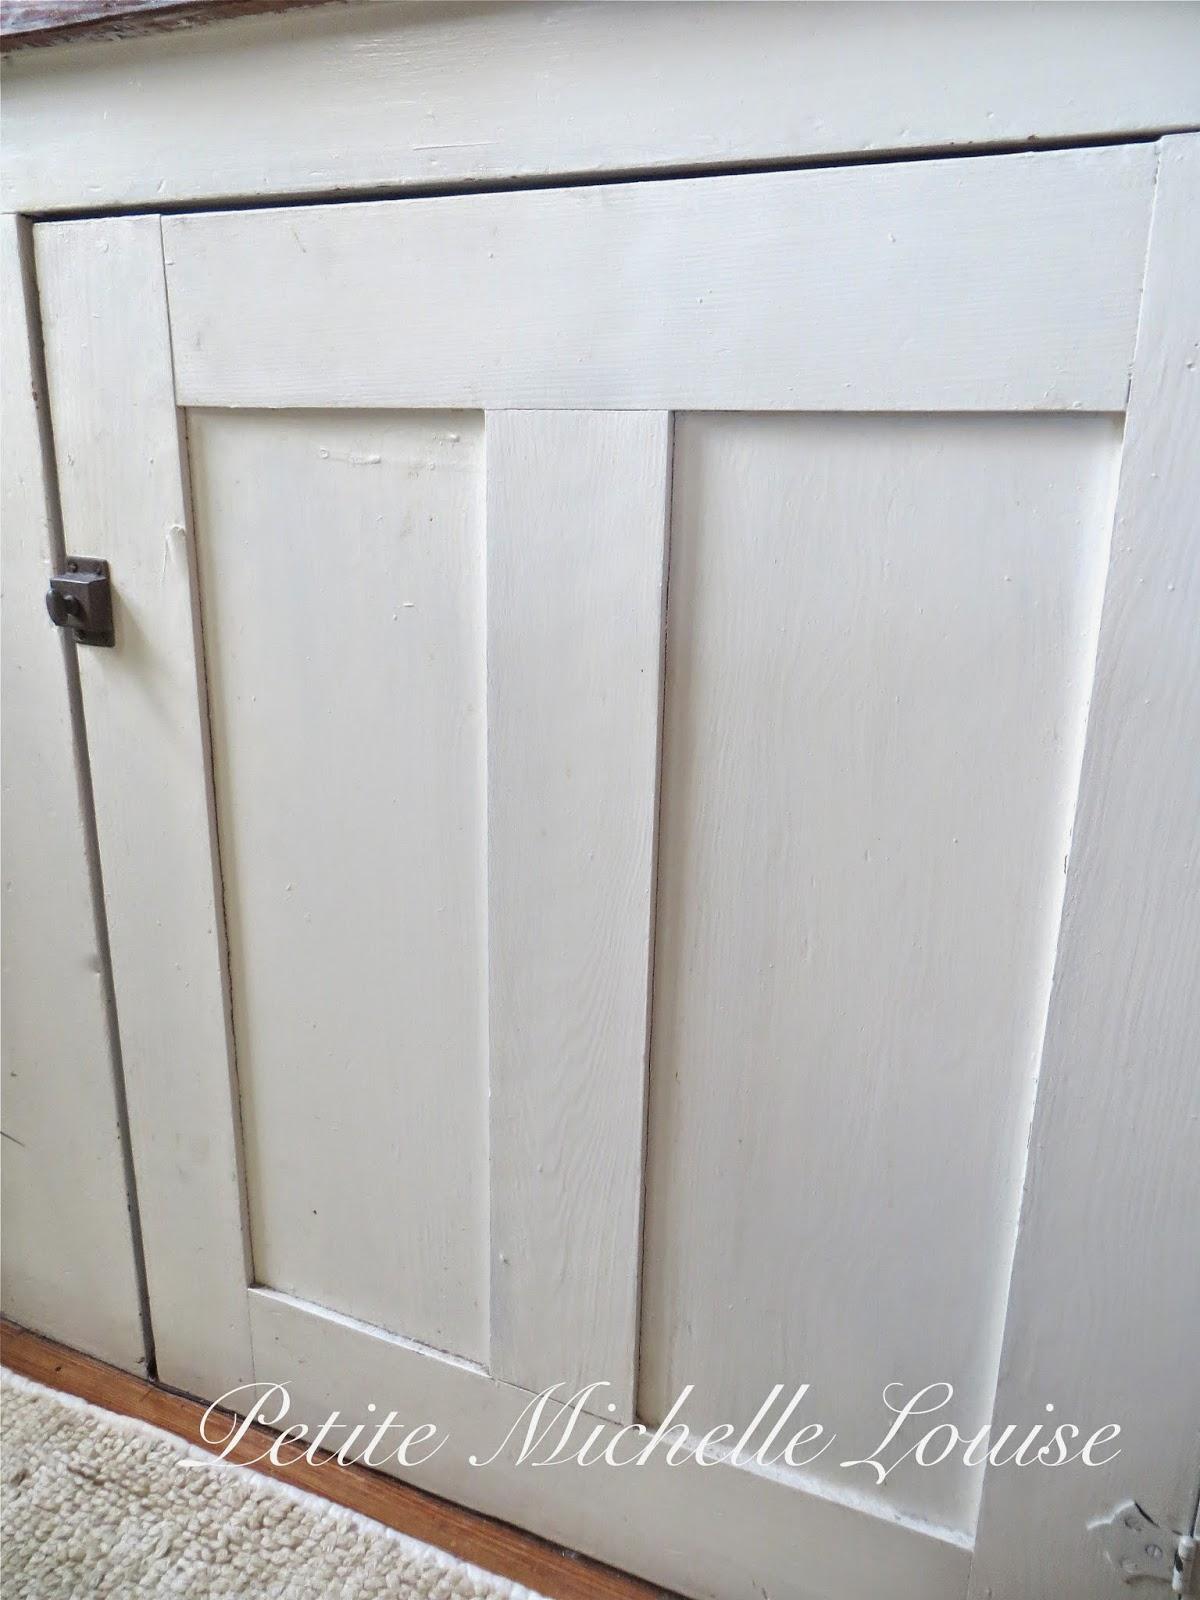 Petite Michelle Louise DIY Cabinet Door Facelift